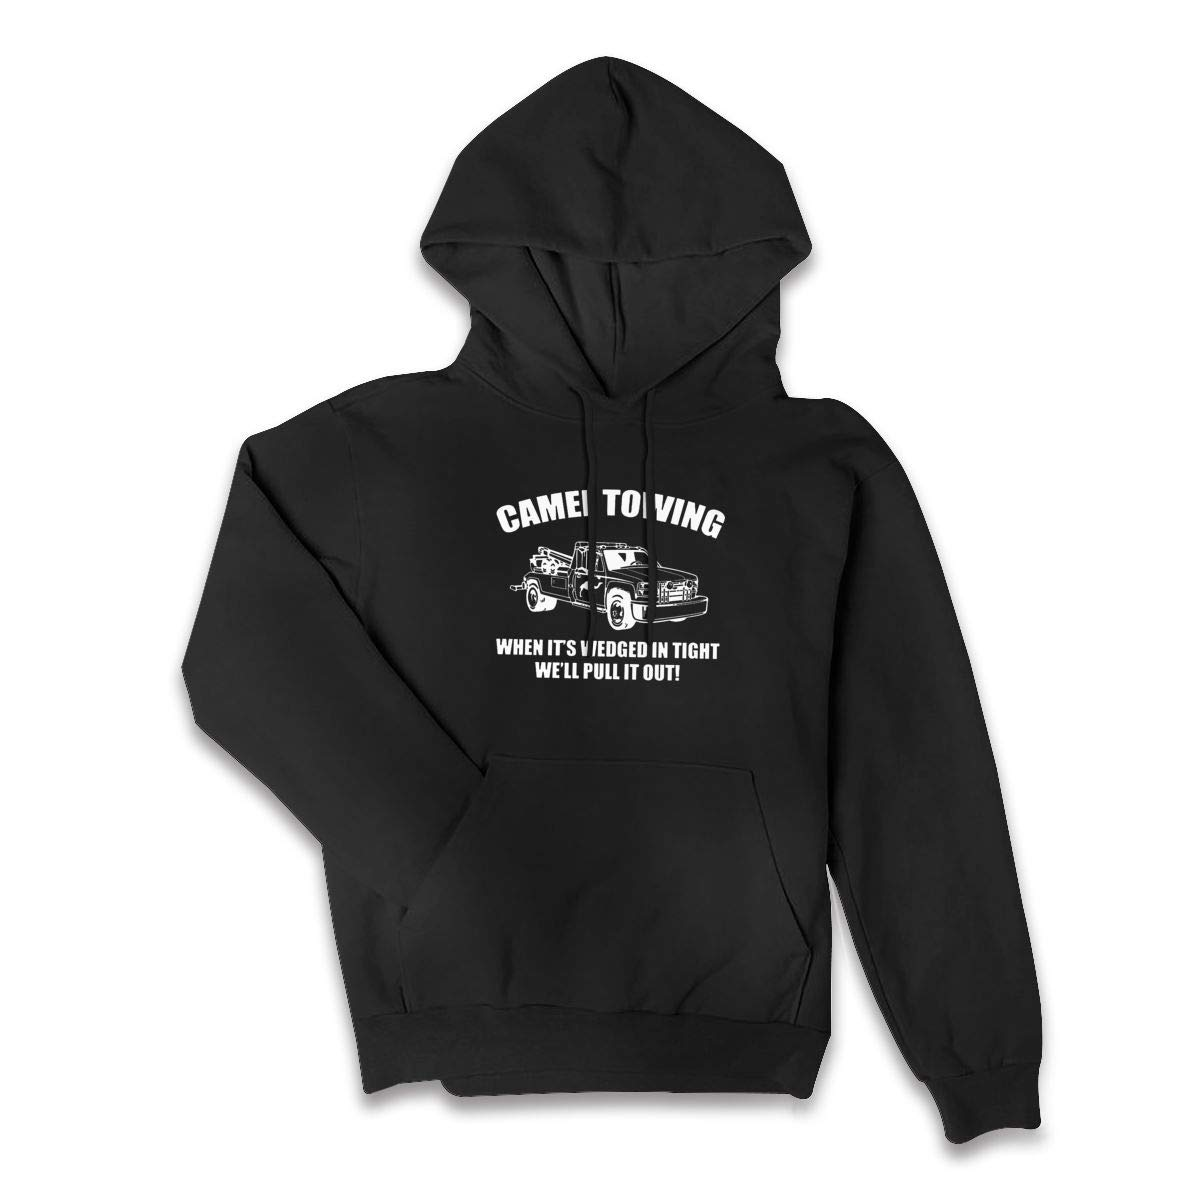 Lponvx Camel Towing Womens Fashion Pullover Hoodie Sweatshirt with Drawstring Hood